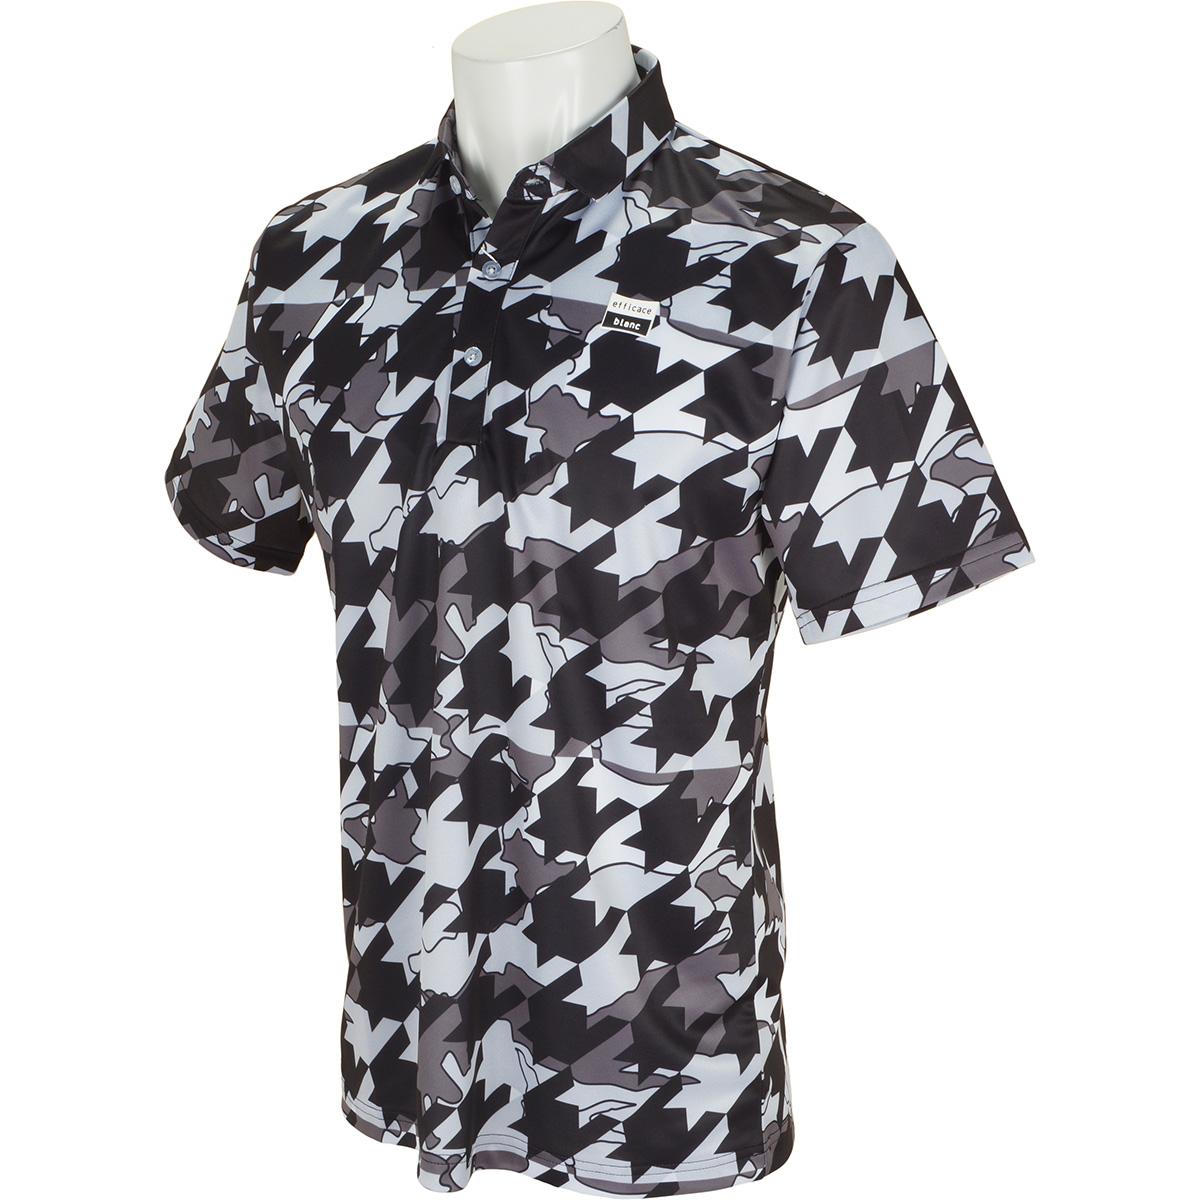 efficace blanc ストレッチ 千鳥柄半袖ポロシャツ